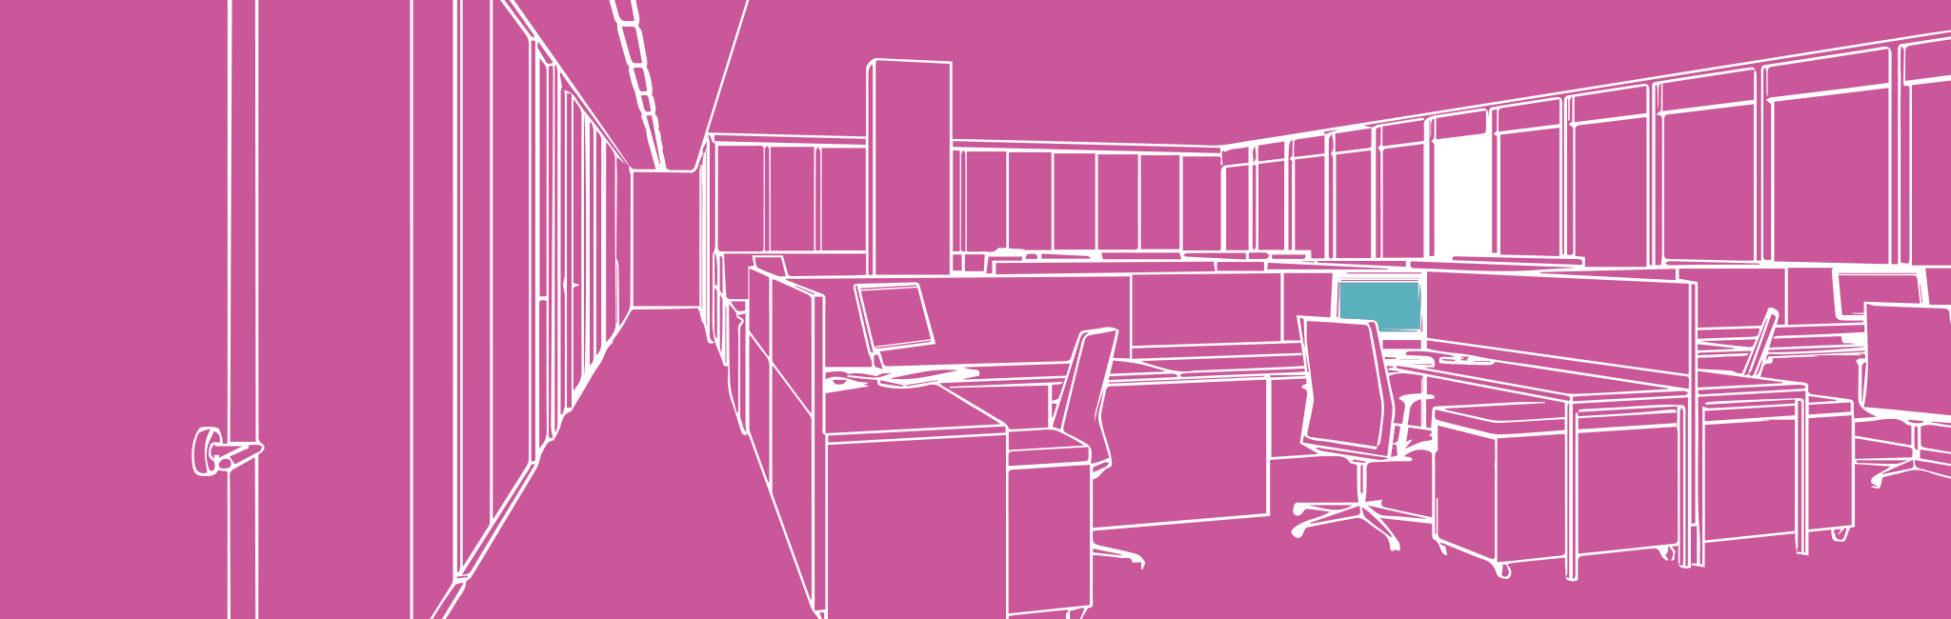 POI case study page office illustration